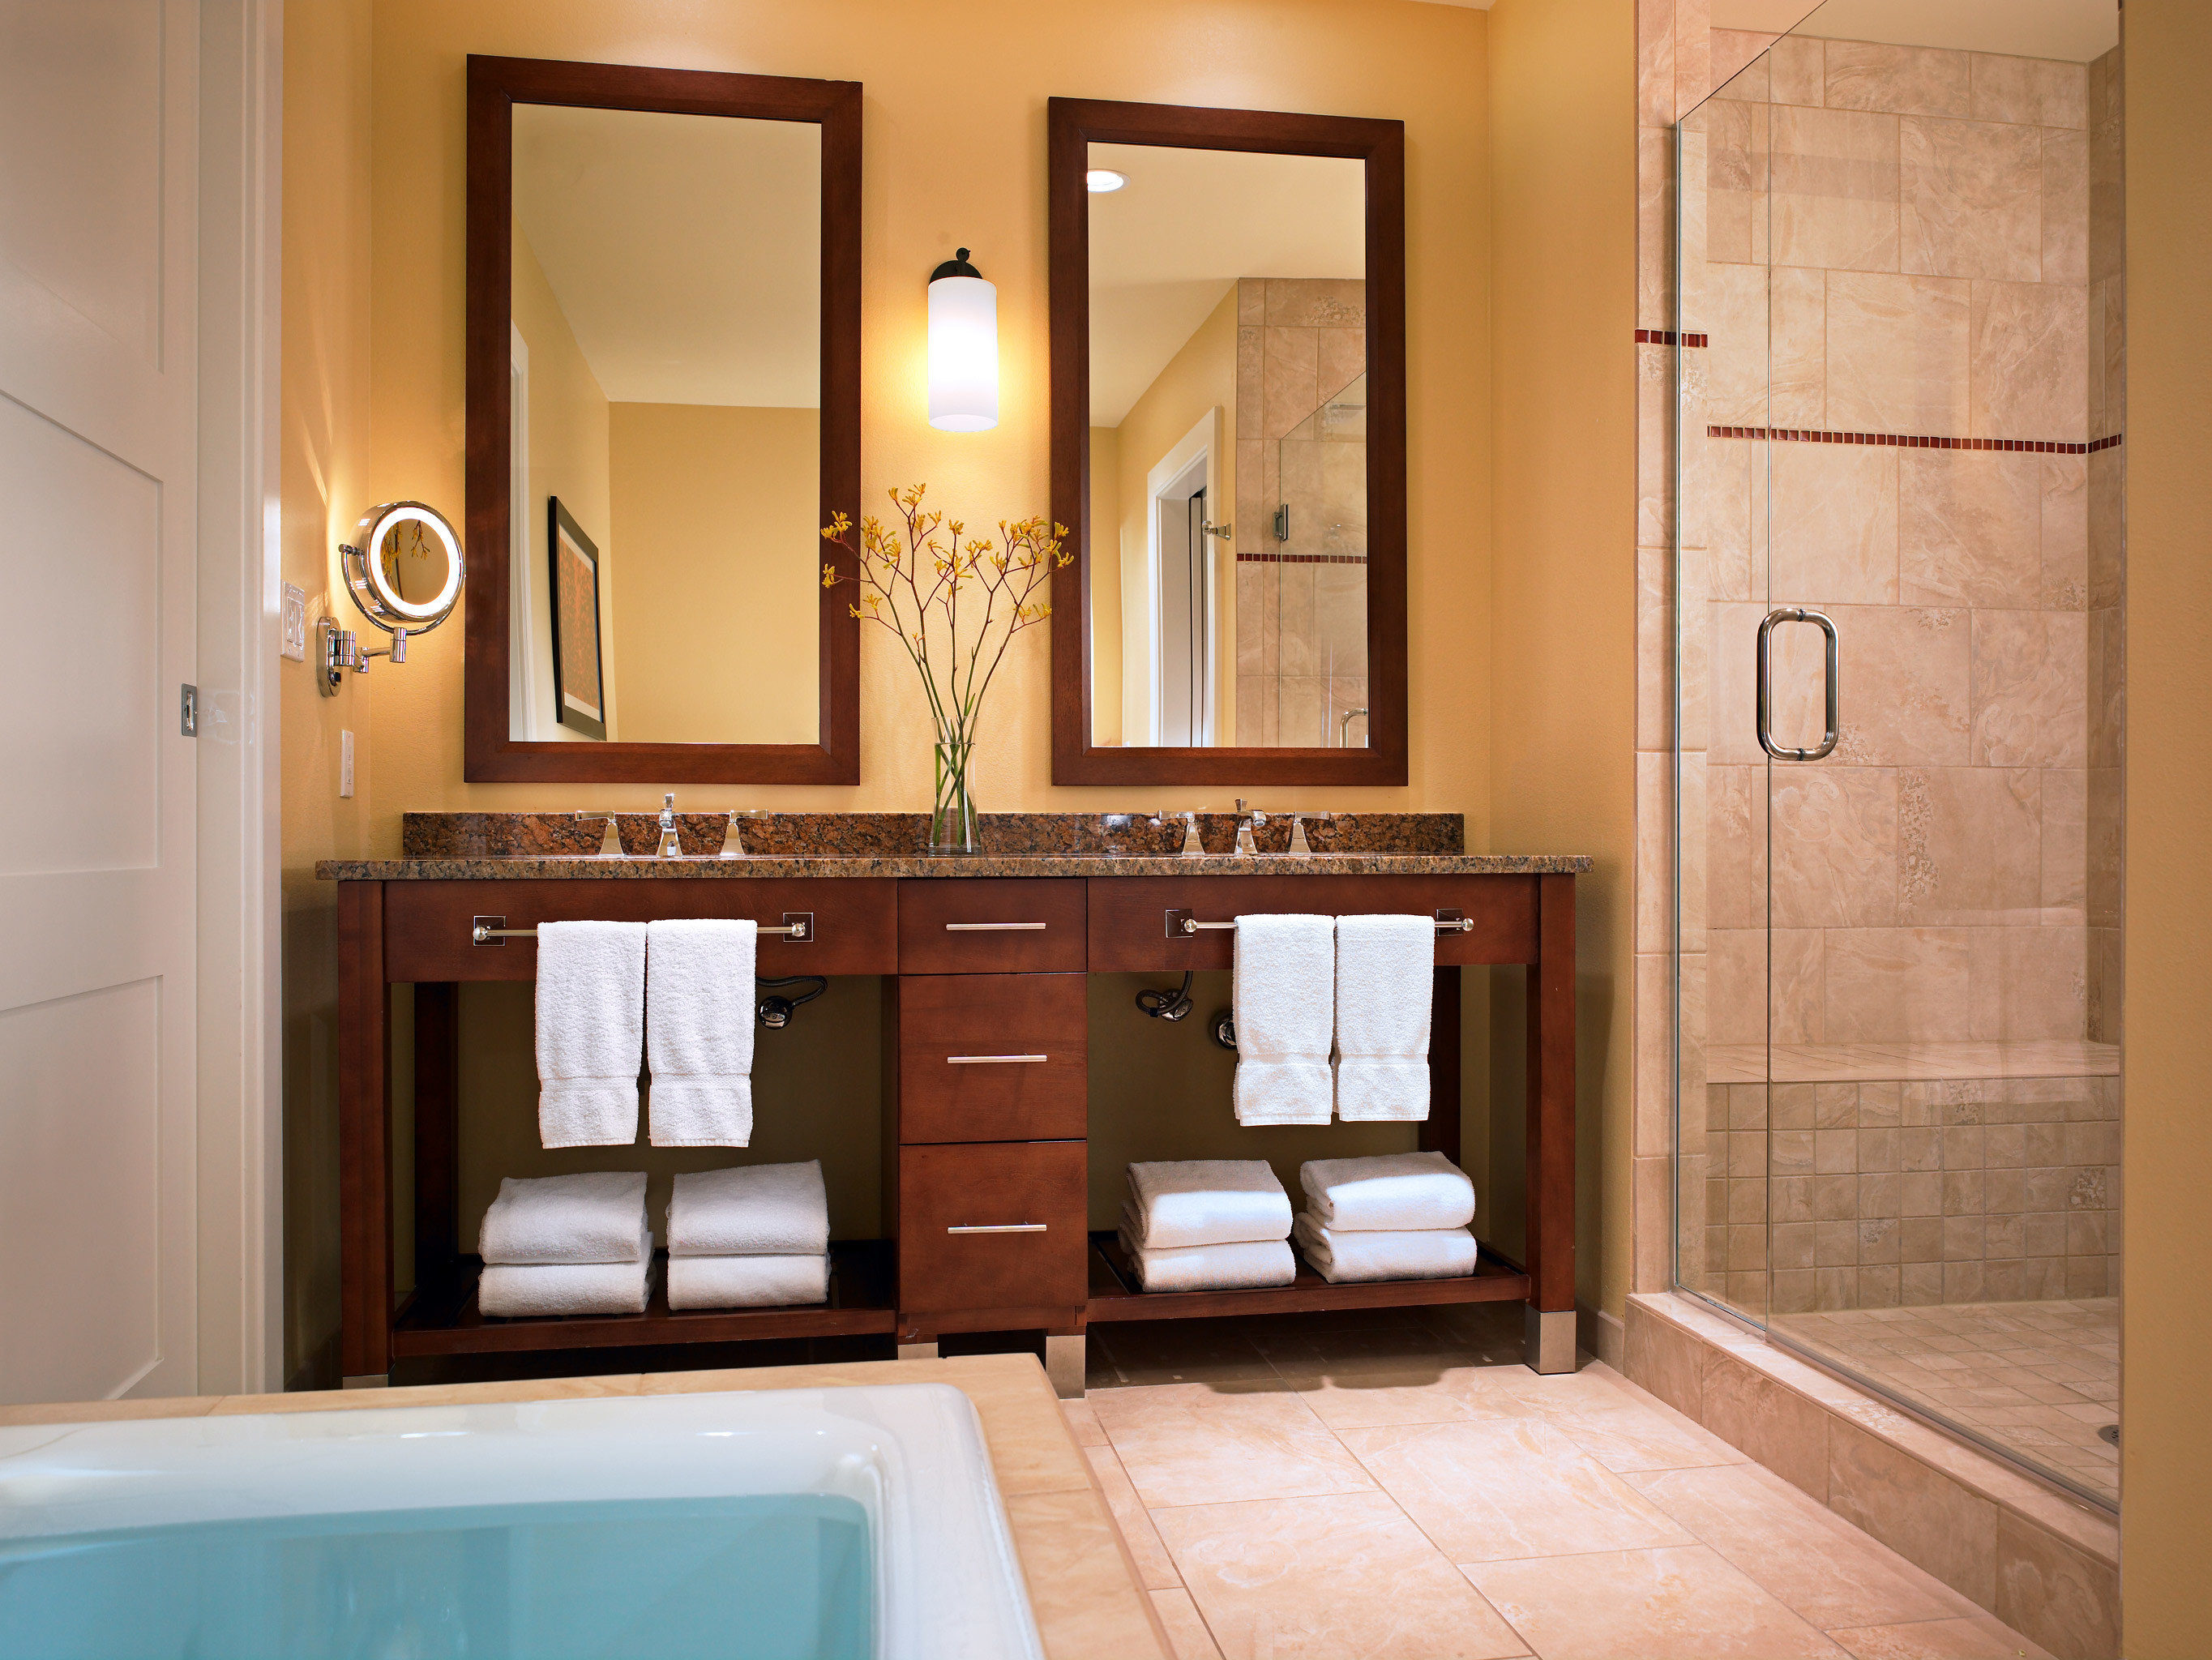 Bath Hot tub Hot tub/Jacuzzi Modern Villa bathroom property sink home cabinetry hardwood flooring Suite mansion plumbing fixture cottage tub tiled